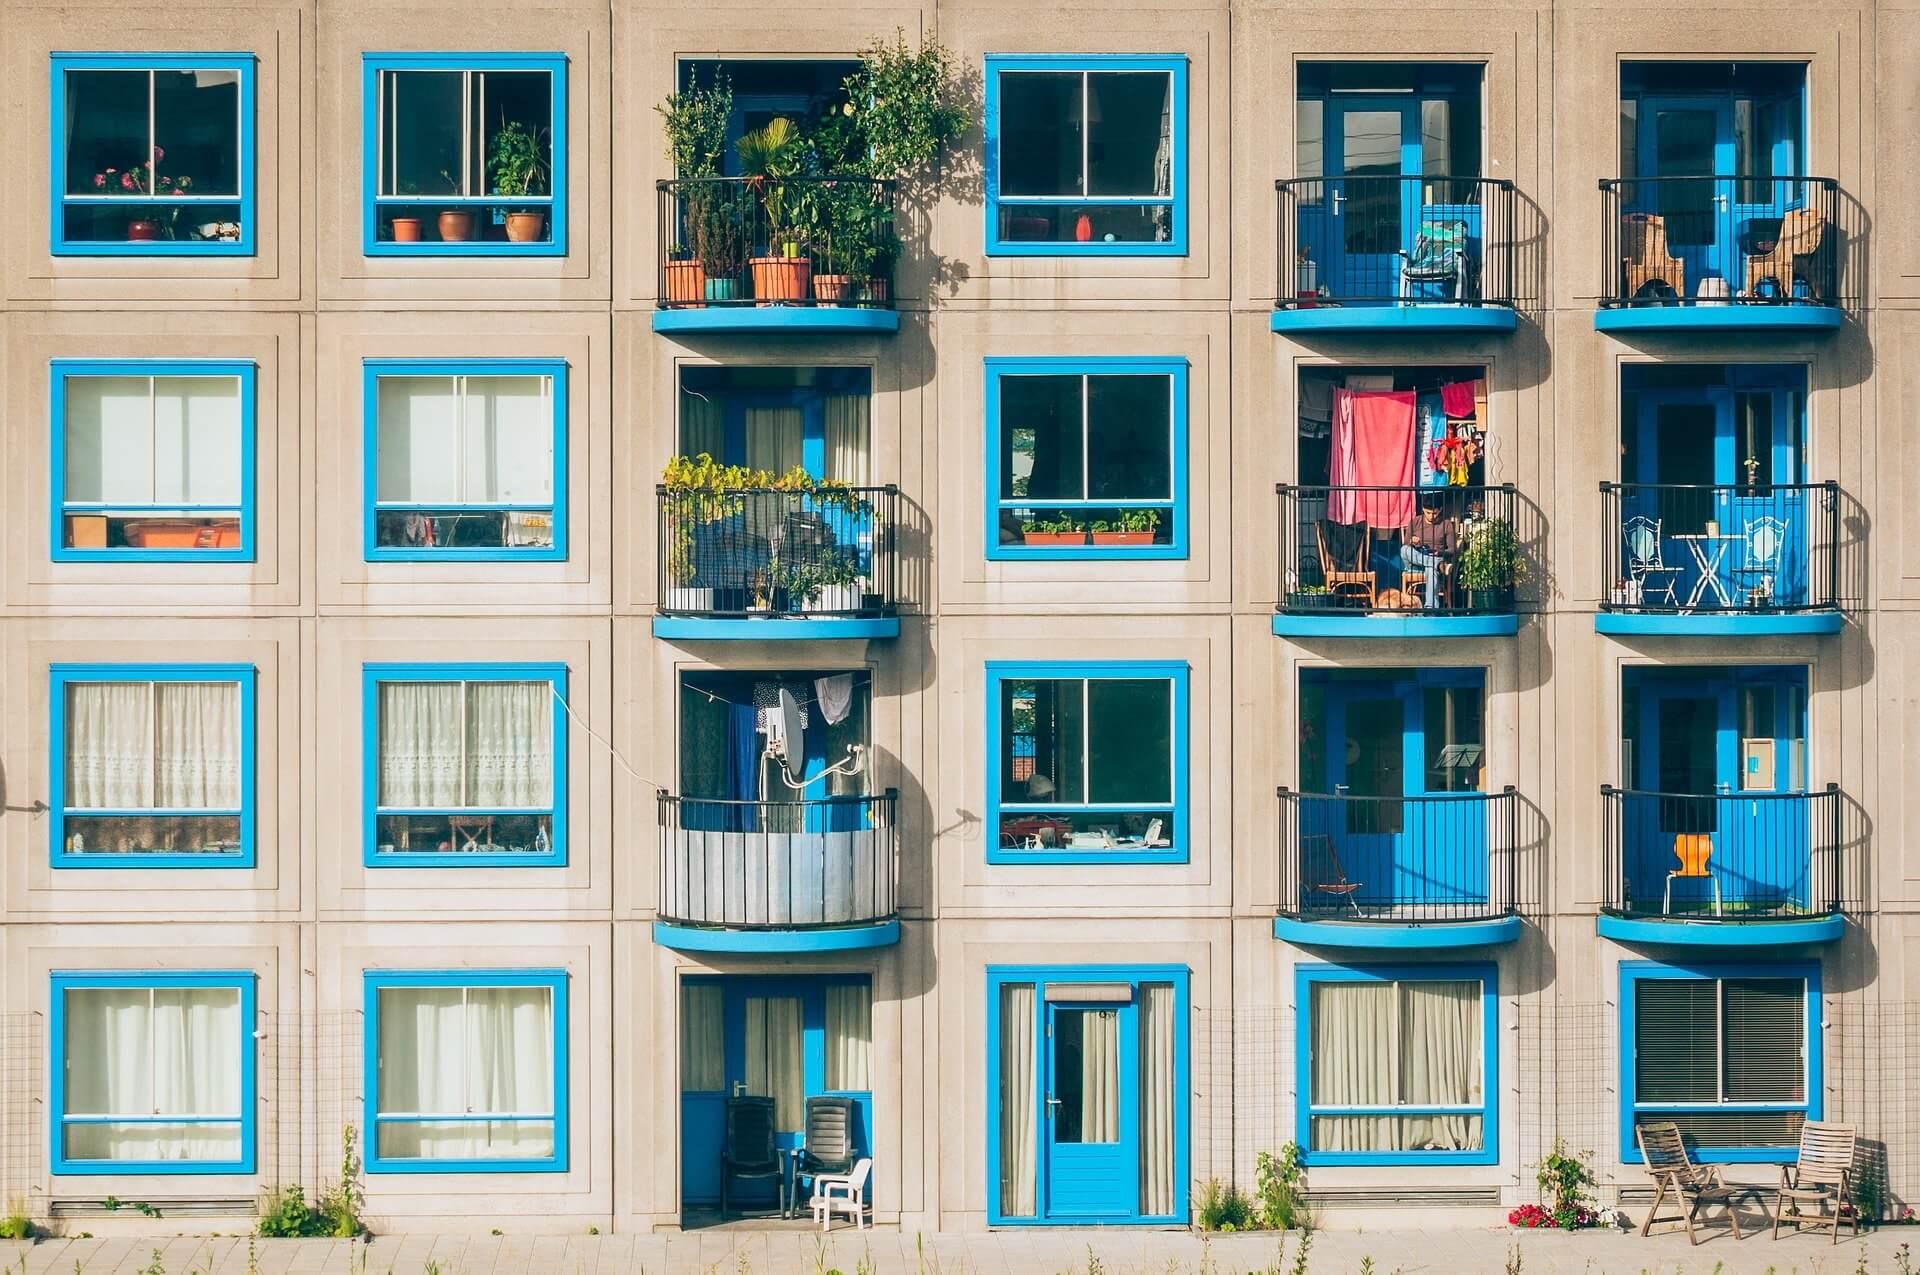 Rehabilitación de fachadas: todo lo que necesitas saber